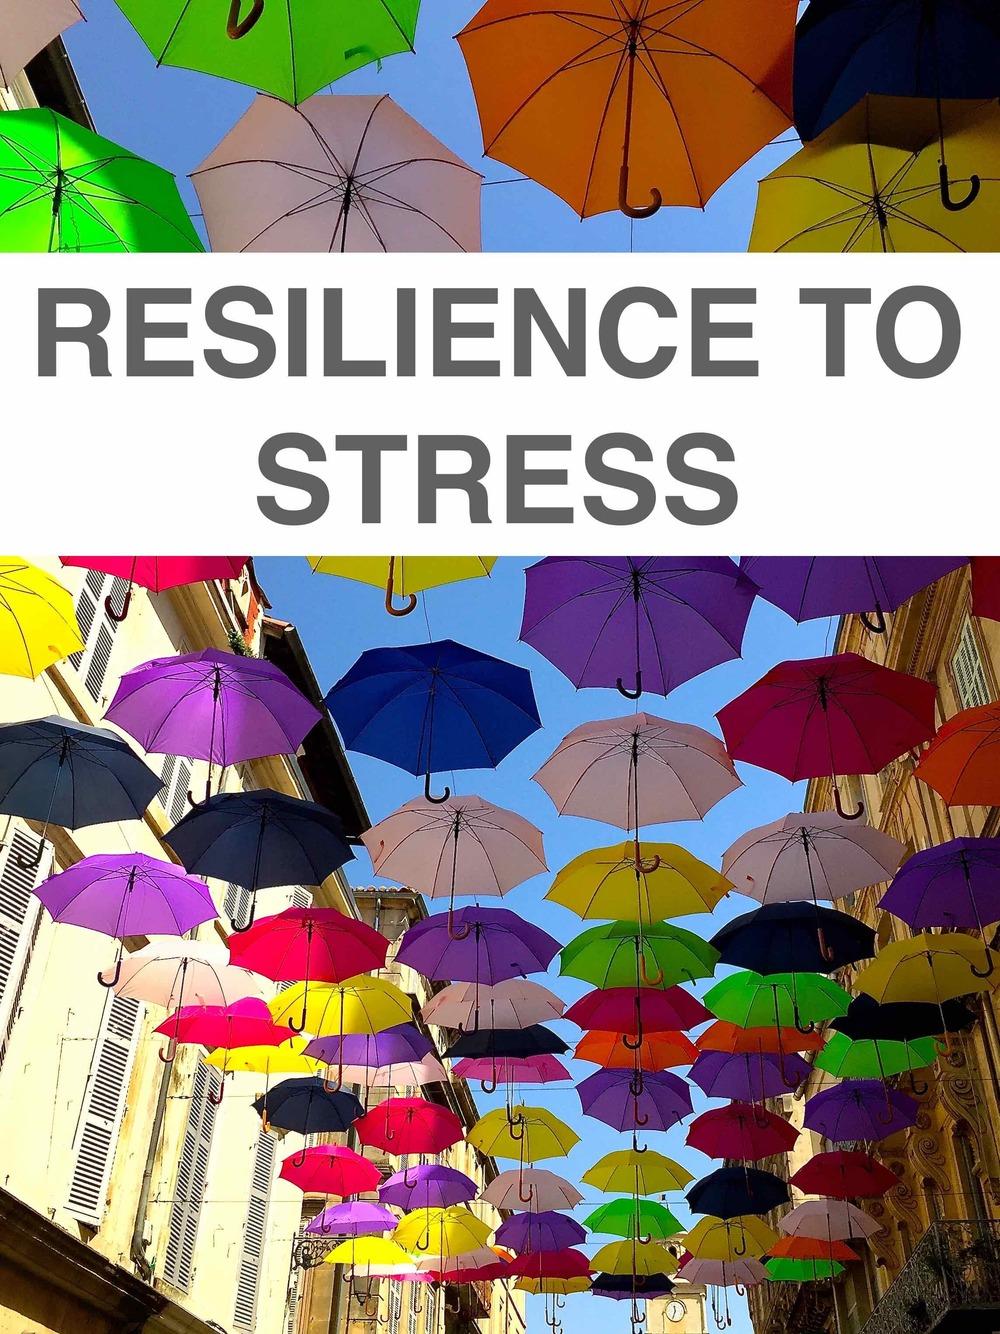 Resilience image.jpg